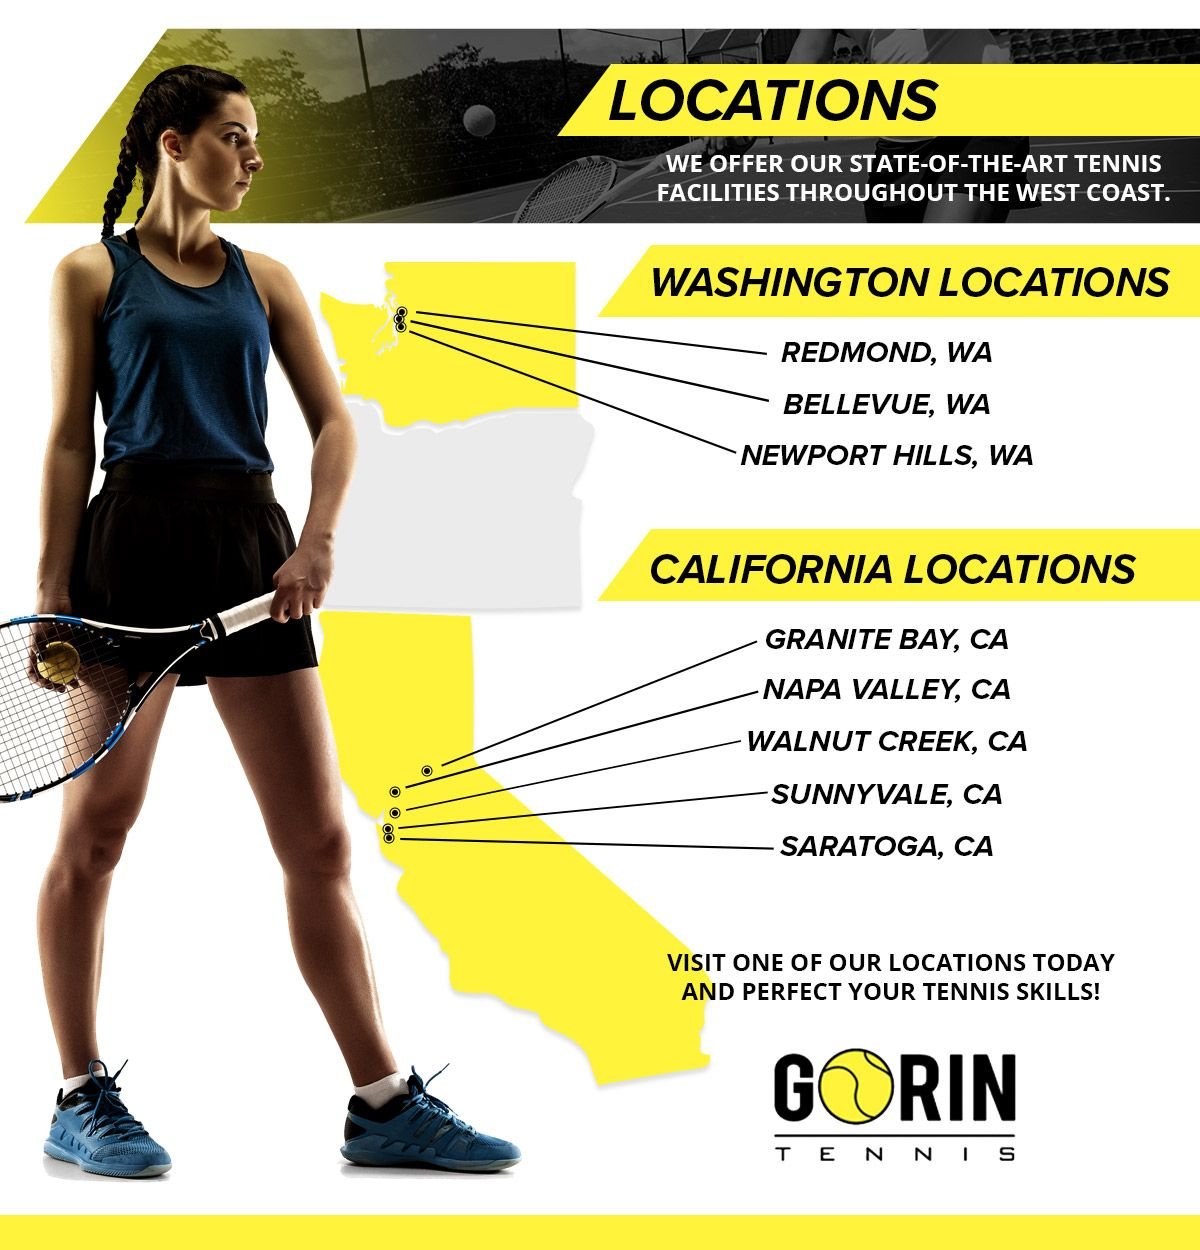 Locations Infographic